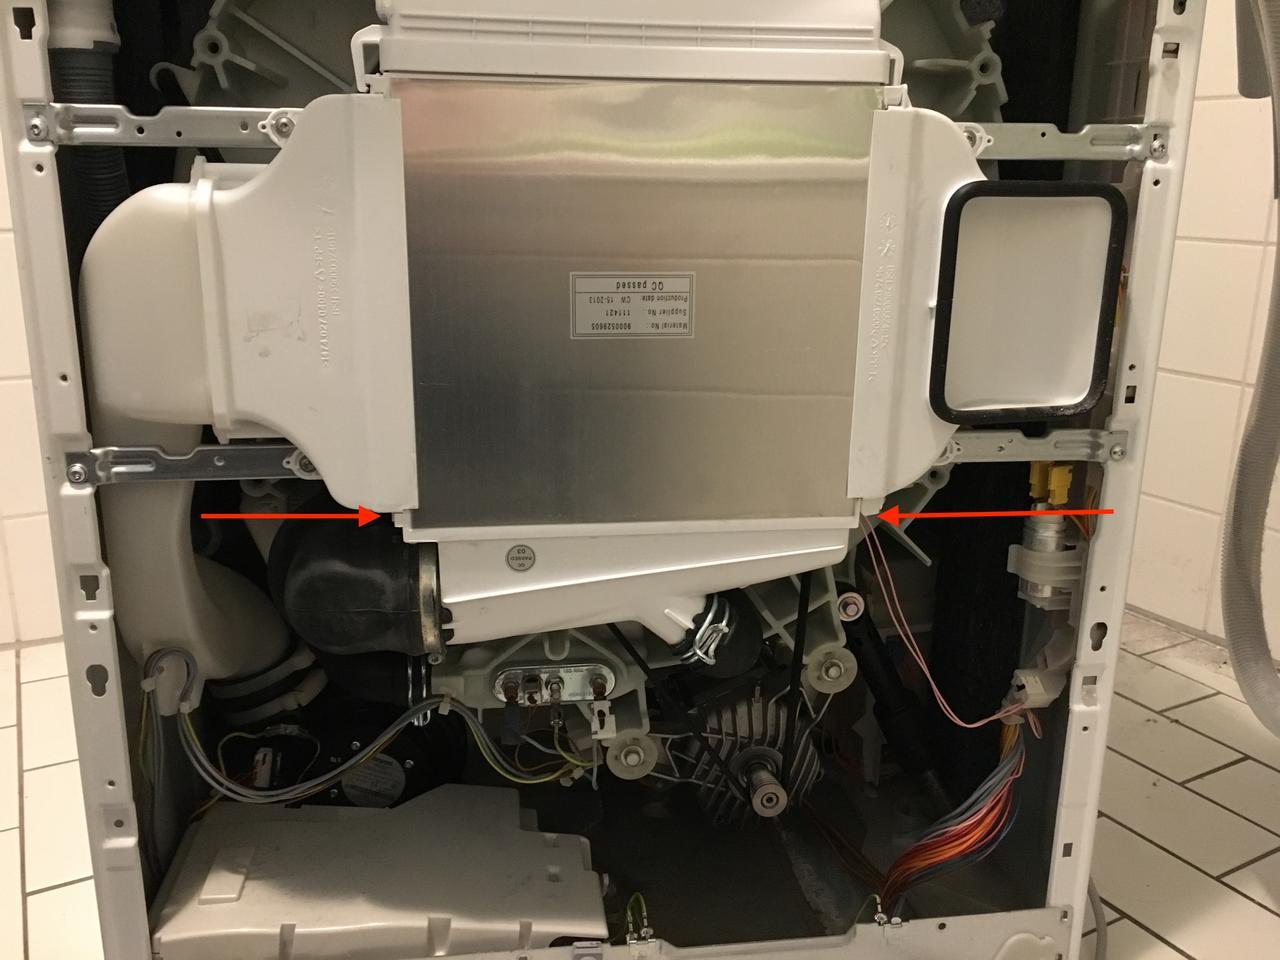 Siemens iq wd h wärmepumpe leckt enorm u elektronik